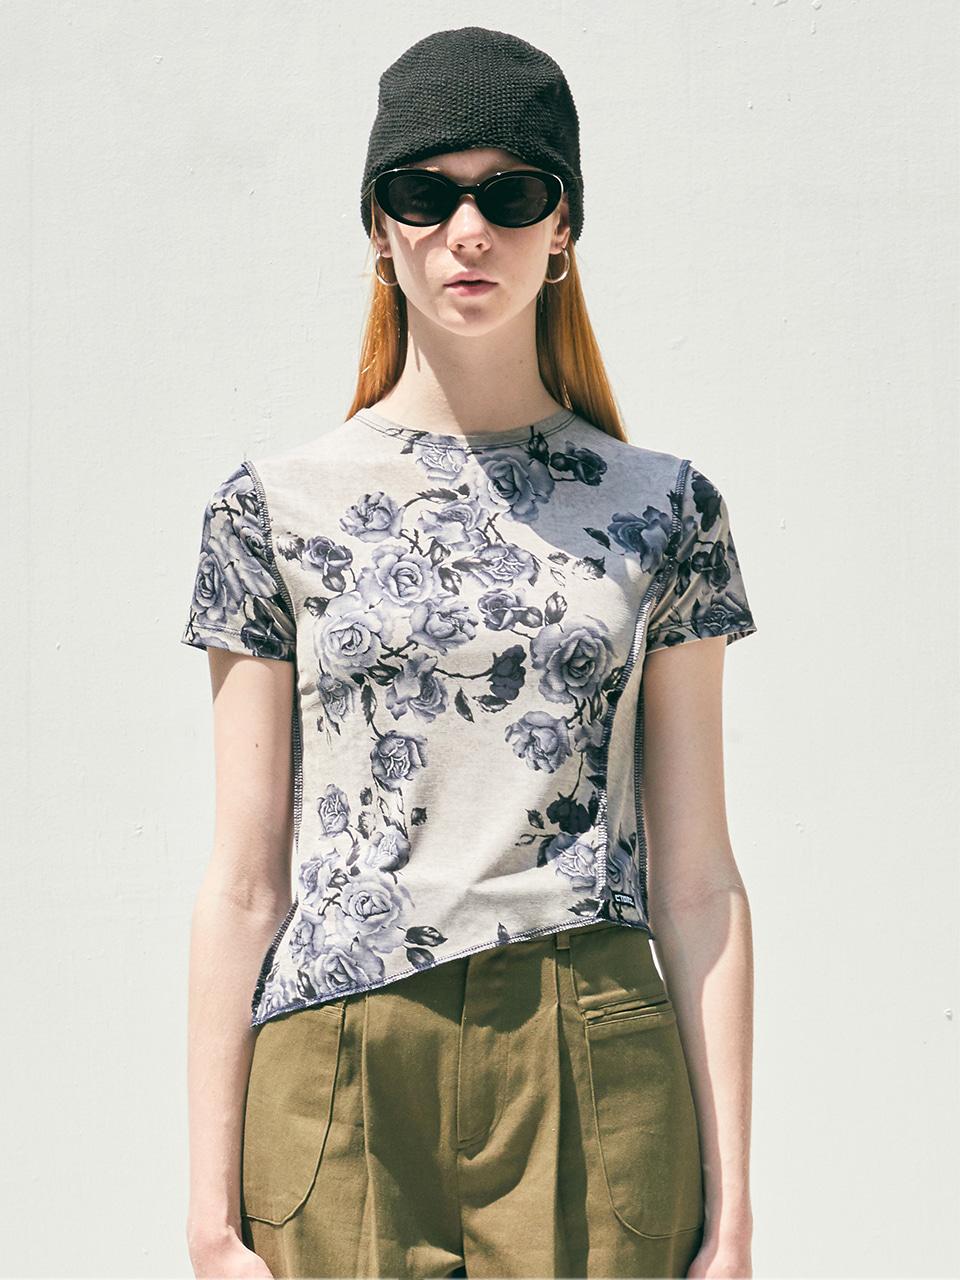 [CITY] Flowery Short Sleeve Tshirt_GREY (CTD2)